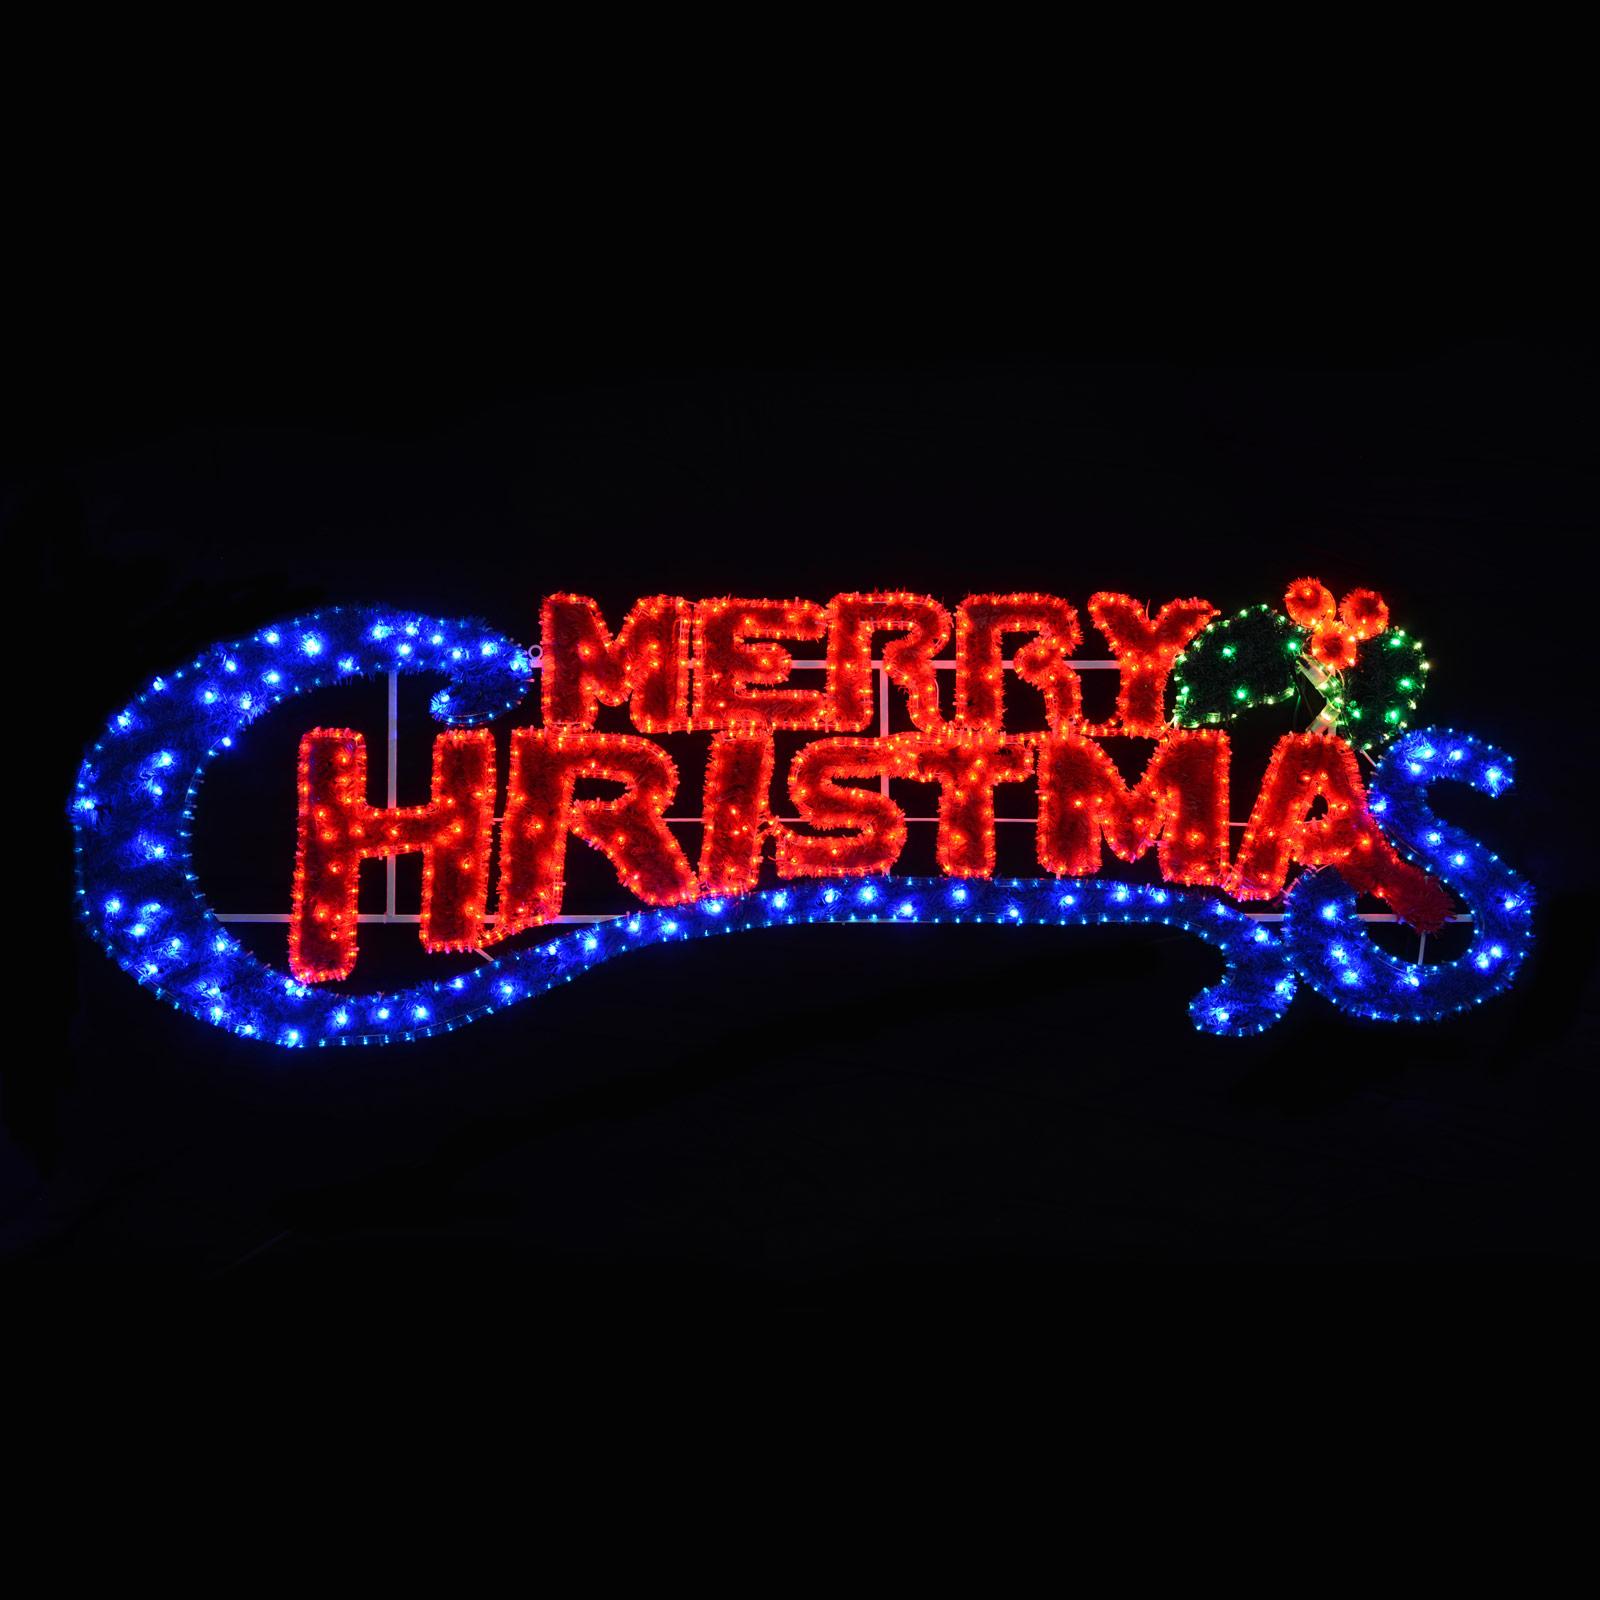 LED Rope Flashing Blue u0026 Red Light Merry Christmas Tinsel Decoration